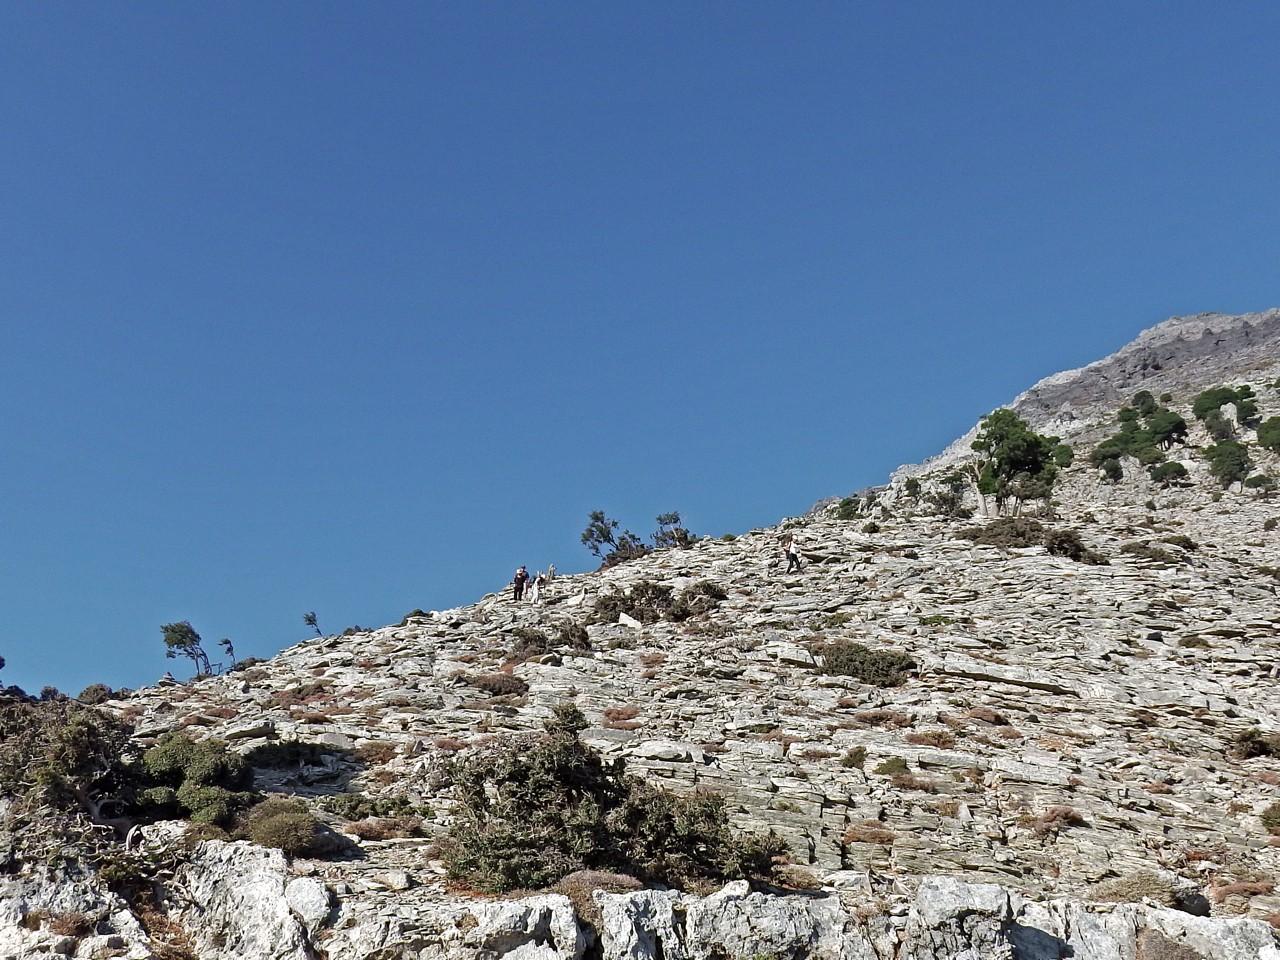 Psiloritis - Guristi Mountain Hiking Trip, hiking trips crete, best activities crete, E4 europe path crete greece, hiking trekking crete